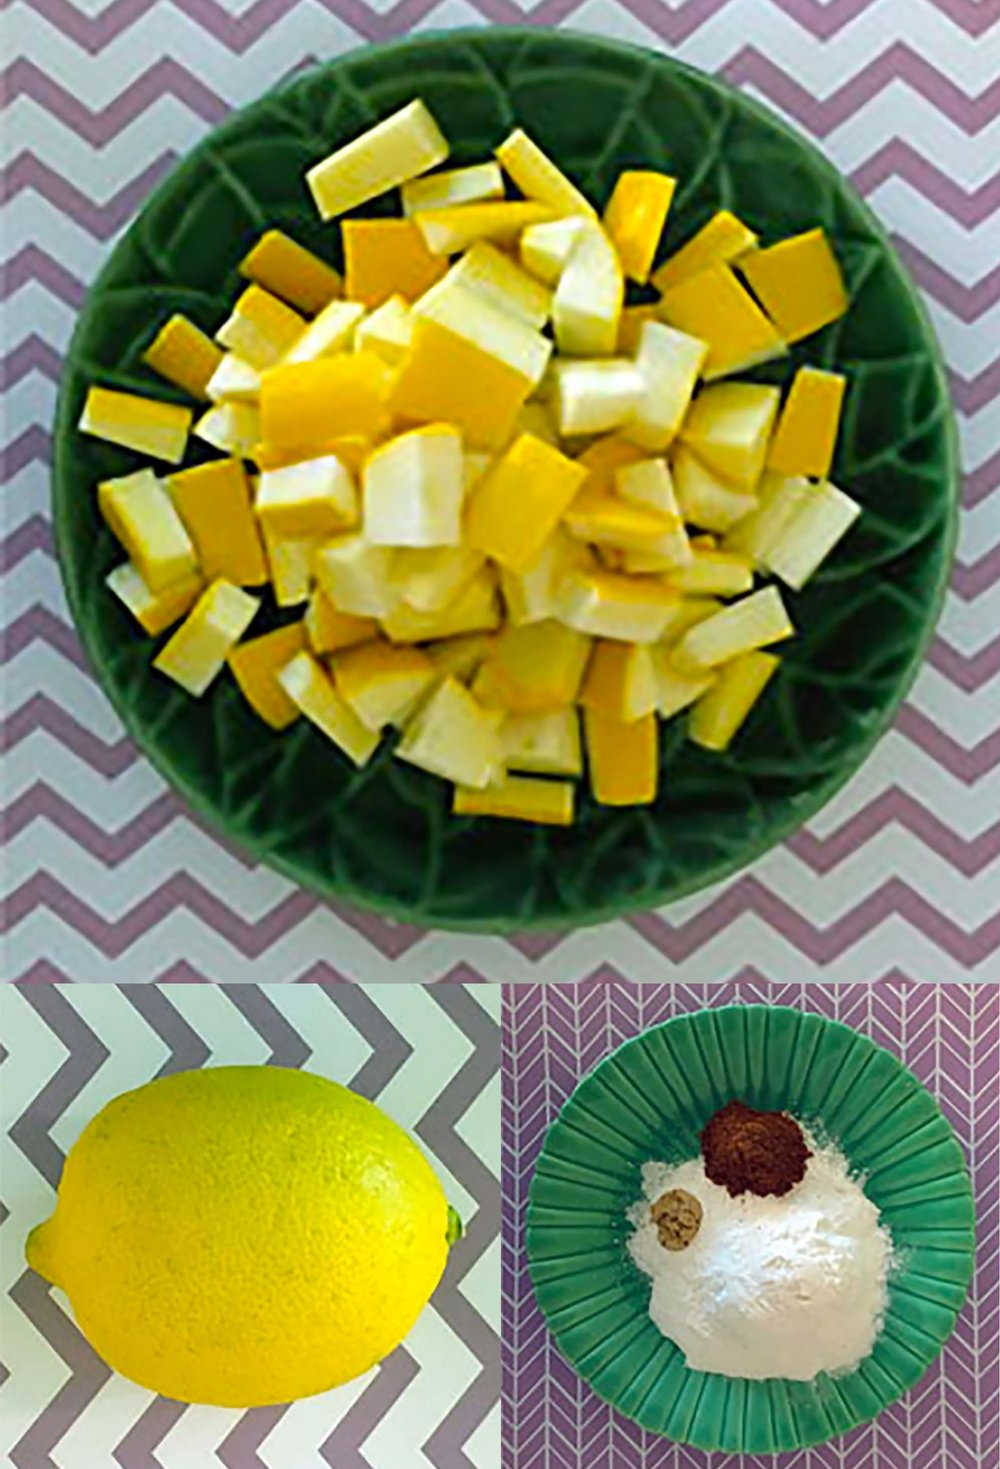 Low Carb Keto Squash Raisins Recipe Ingredients